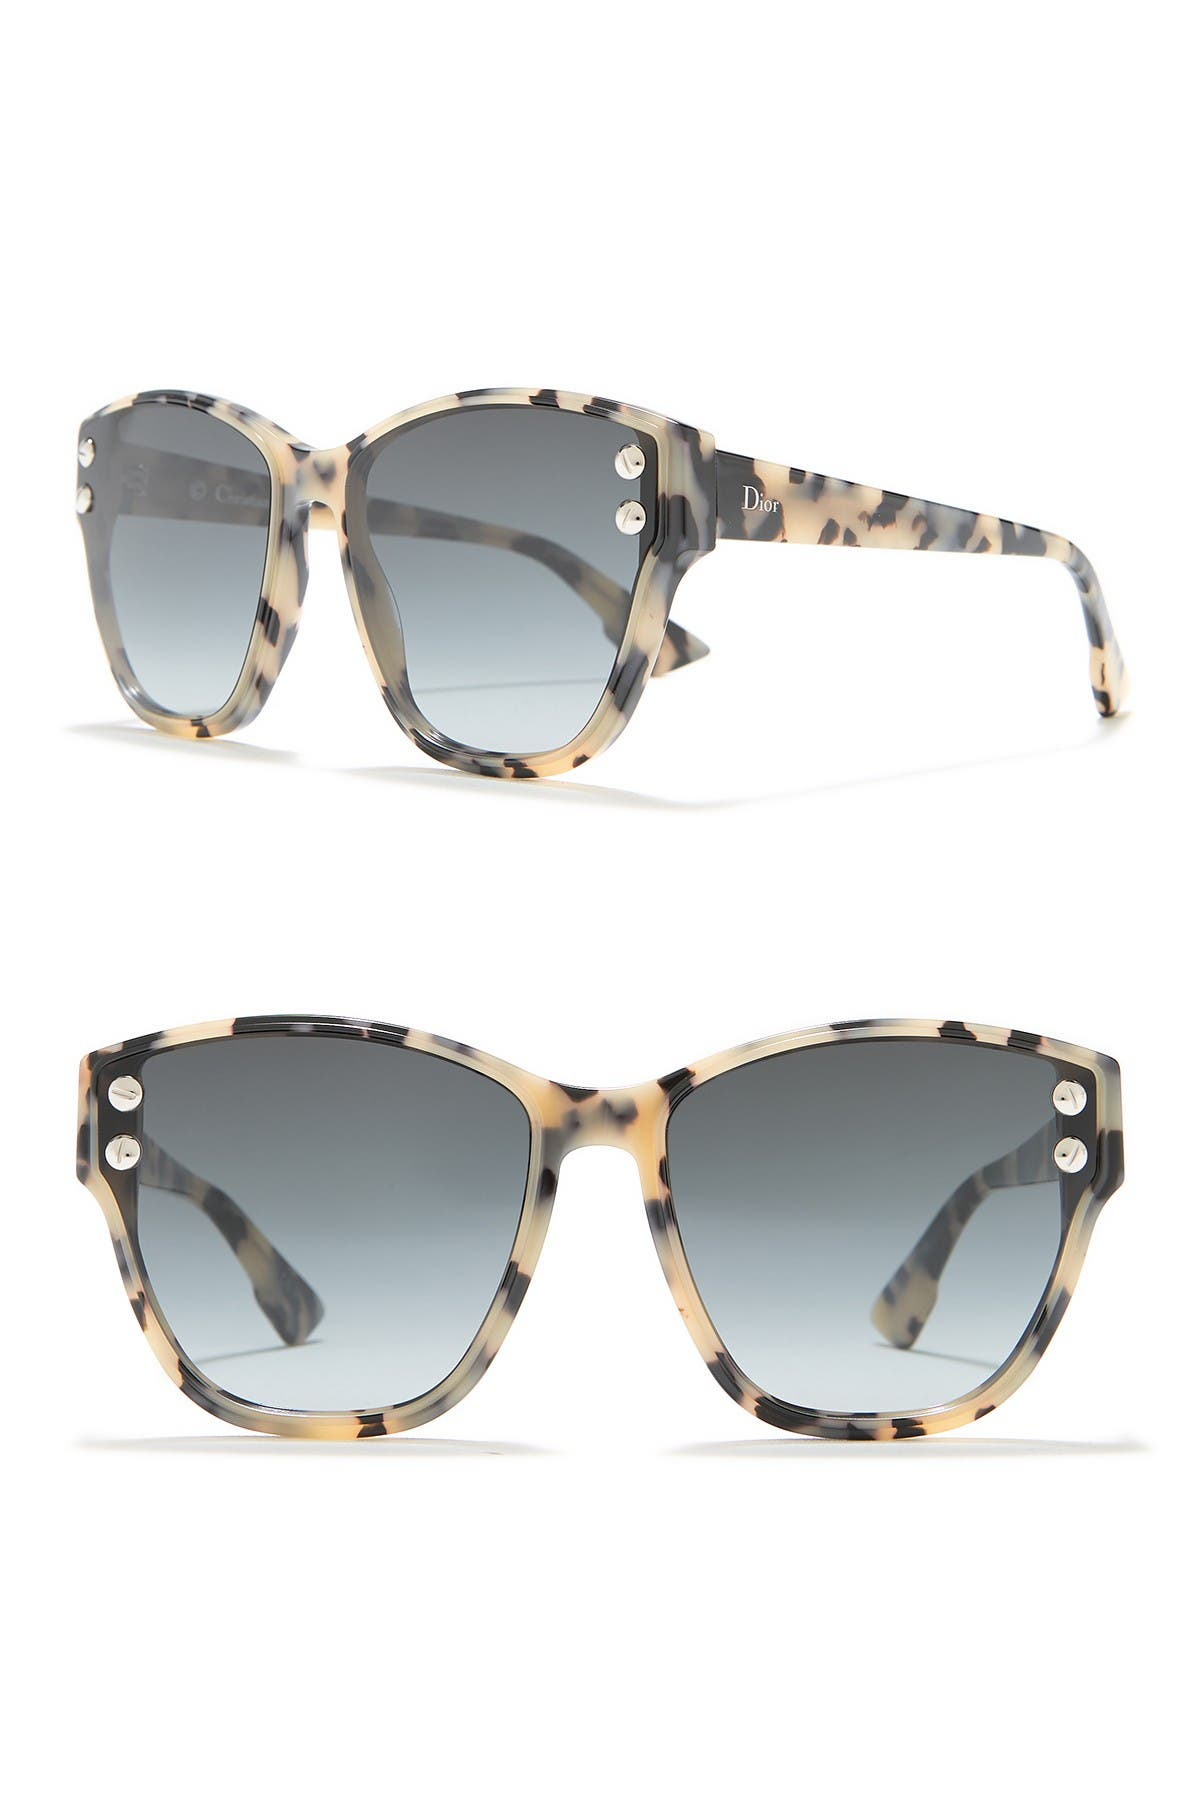 Image of Dior 60mm Dior Sunglasses